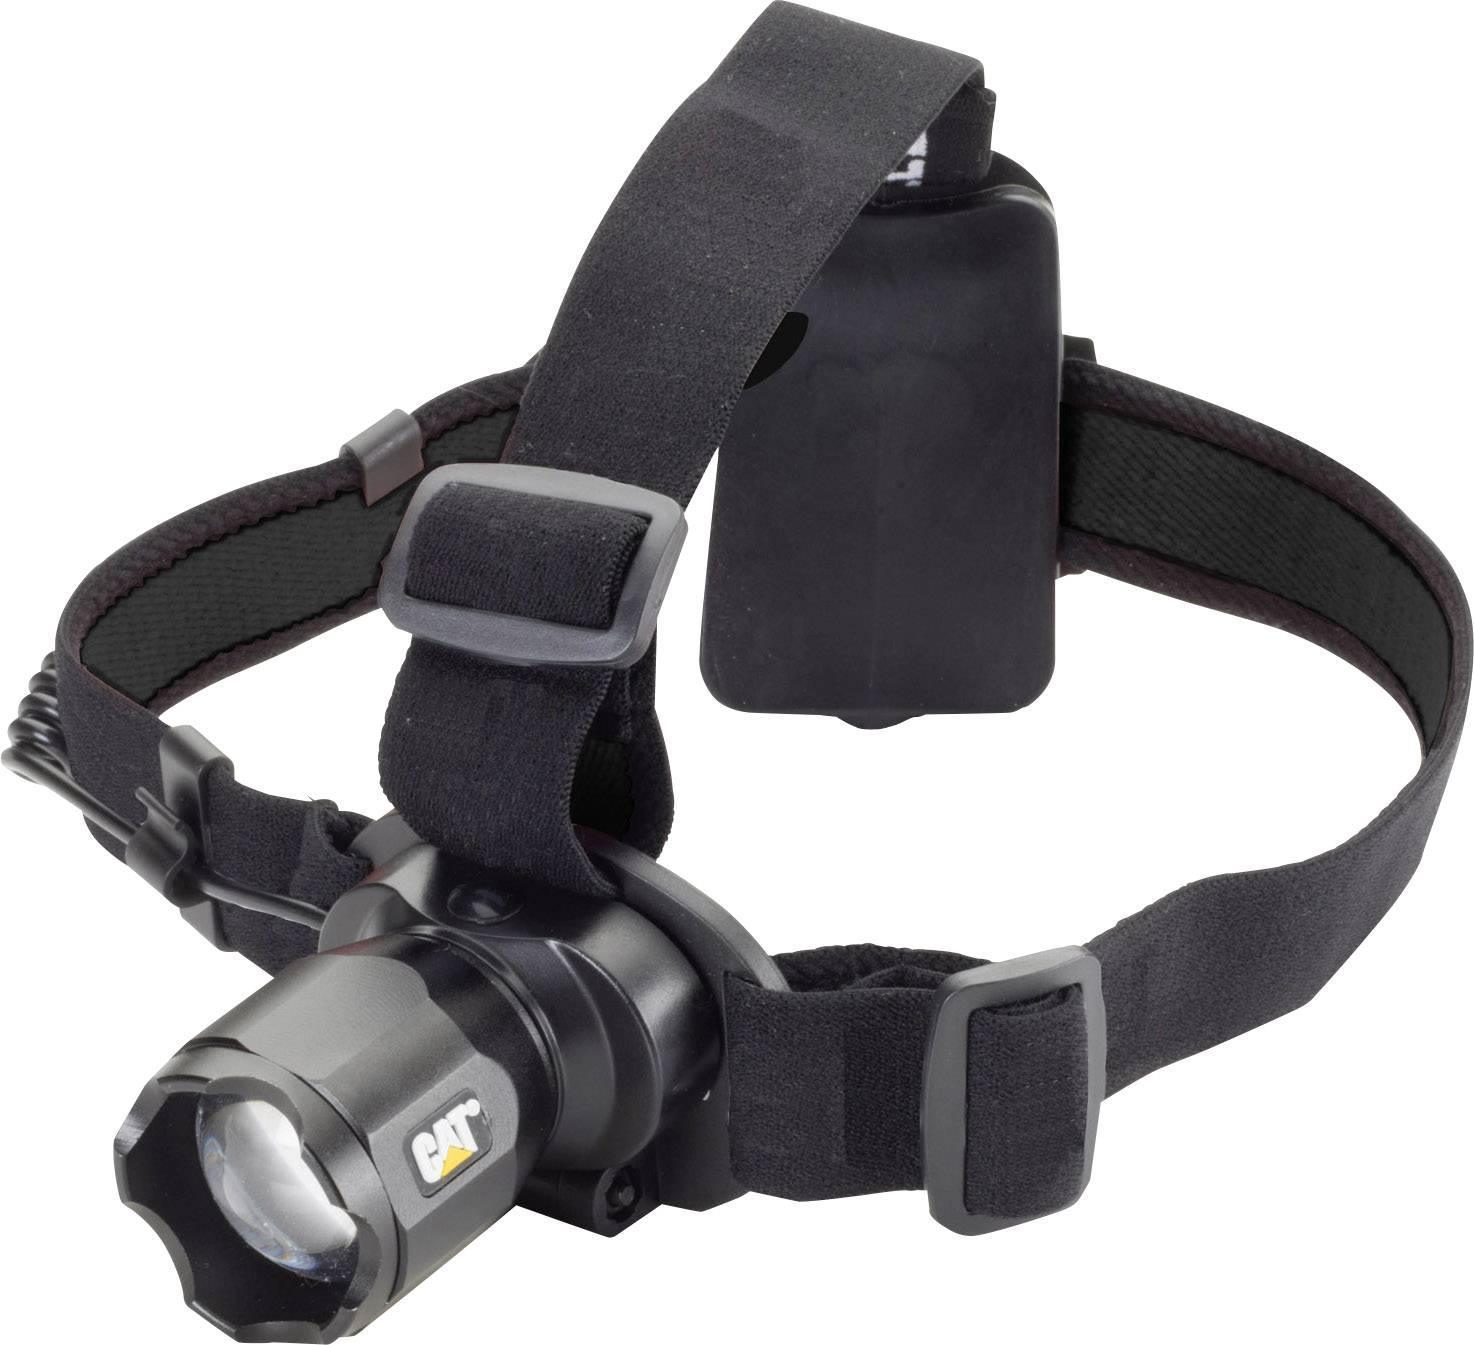 Pracovná LED čelovka CAT Focusing Headlamp CT4200, na batérie, 250 g, čierna